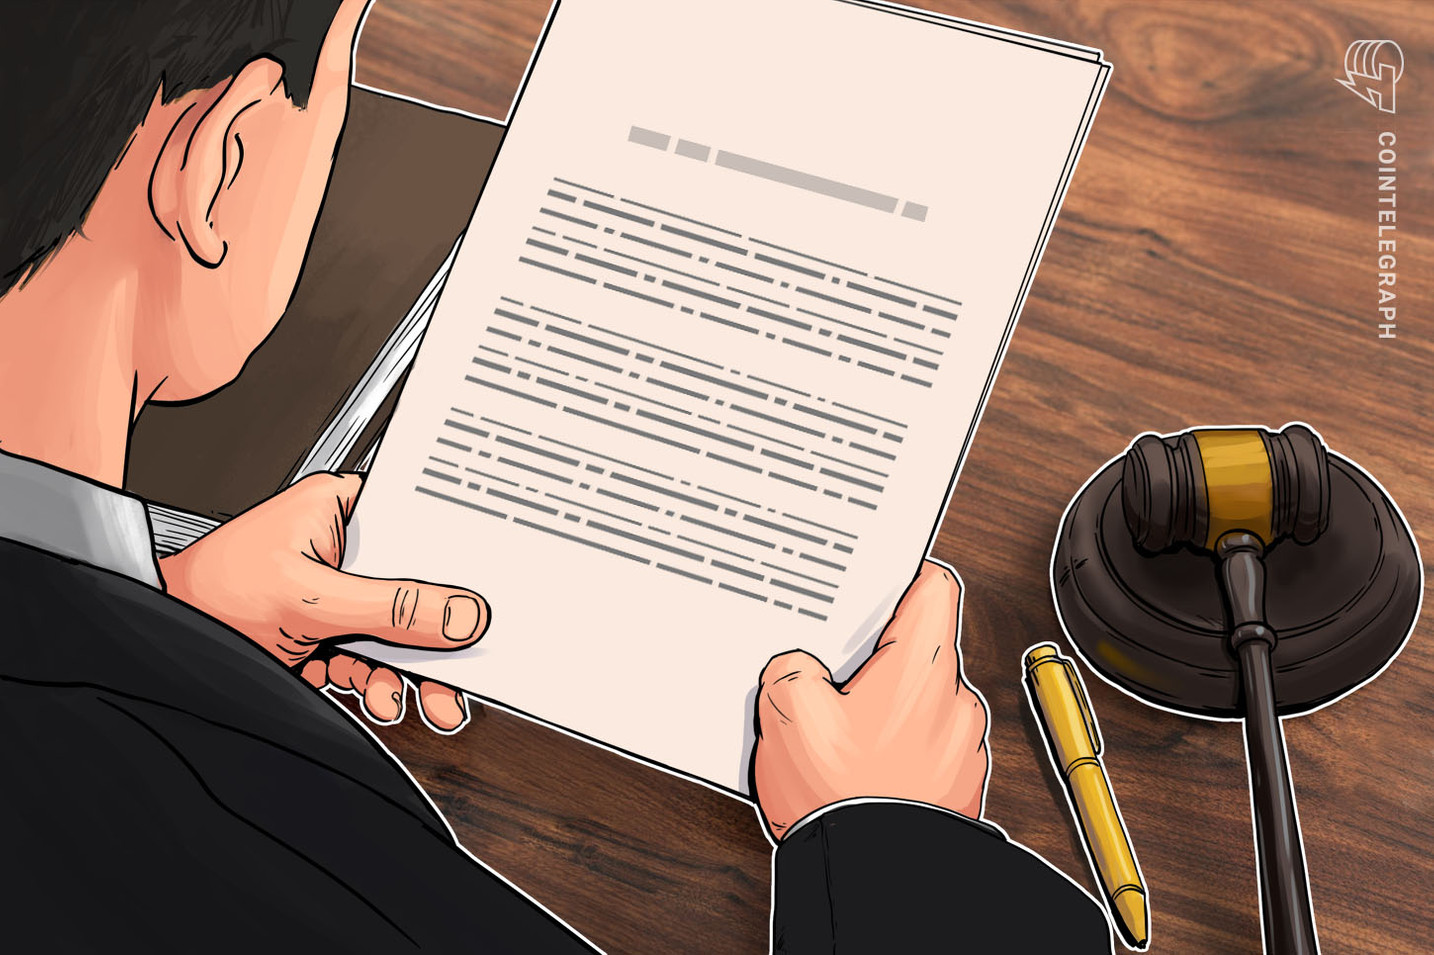 Former Investor Sues OneCoin Scheme, Seeks Class Action